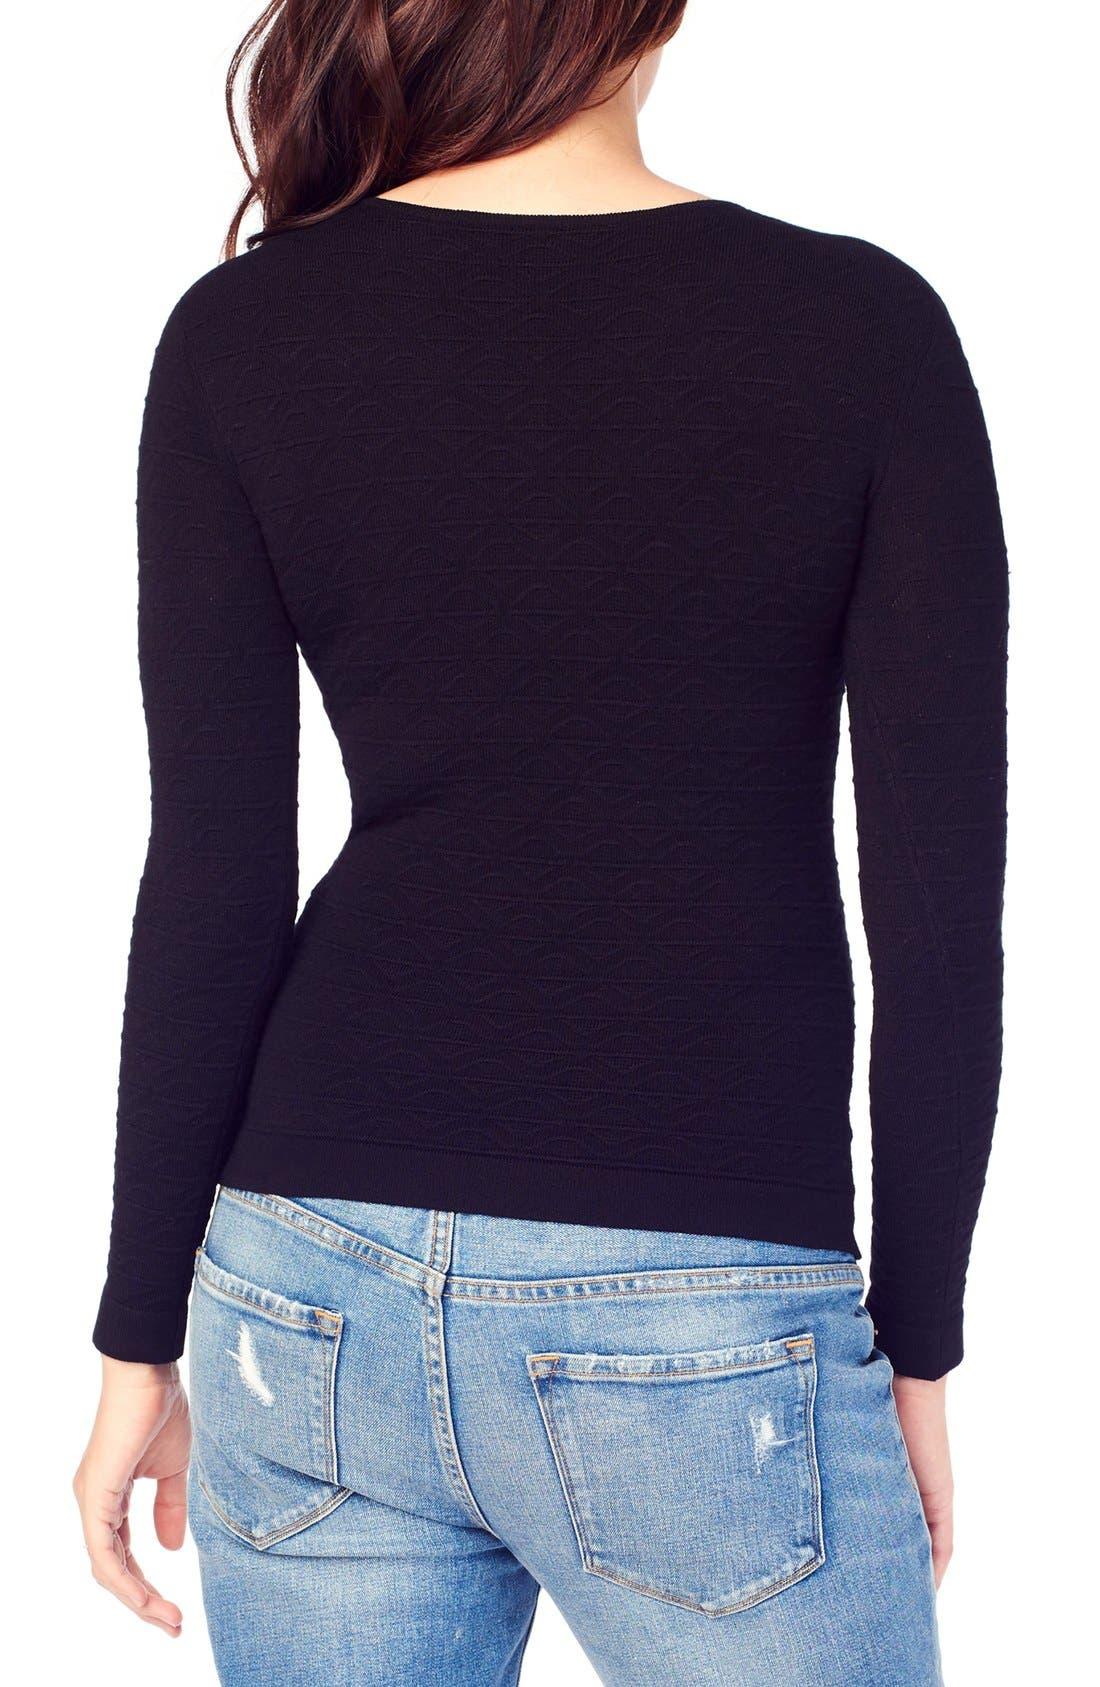 Ingrid & Isabel Textured Knit Maternity Sweater,                             Alternate thumbnail 2, color,                             JET BLACK